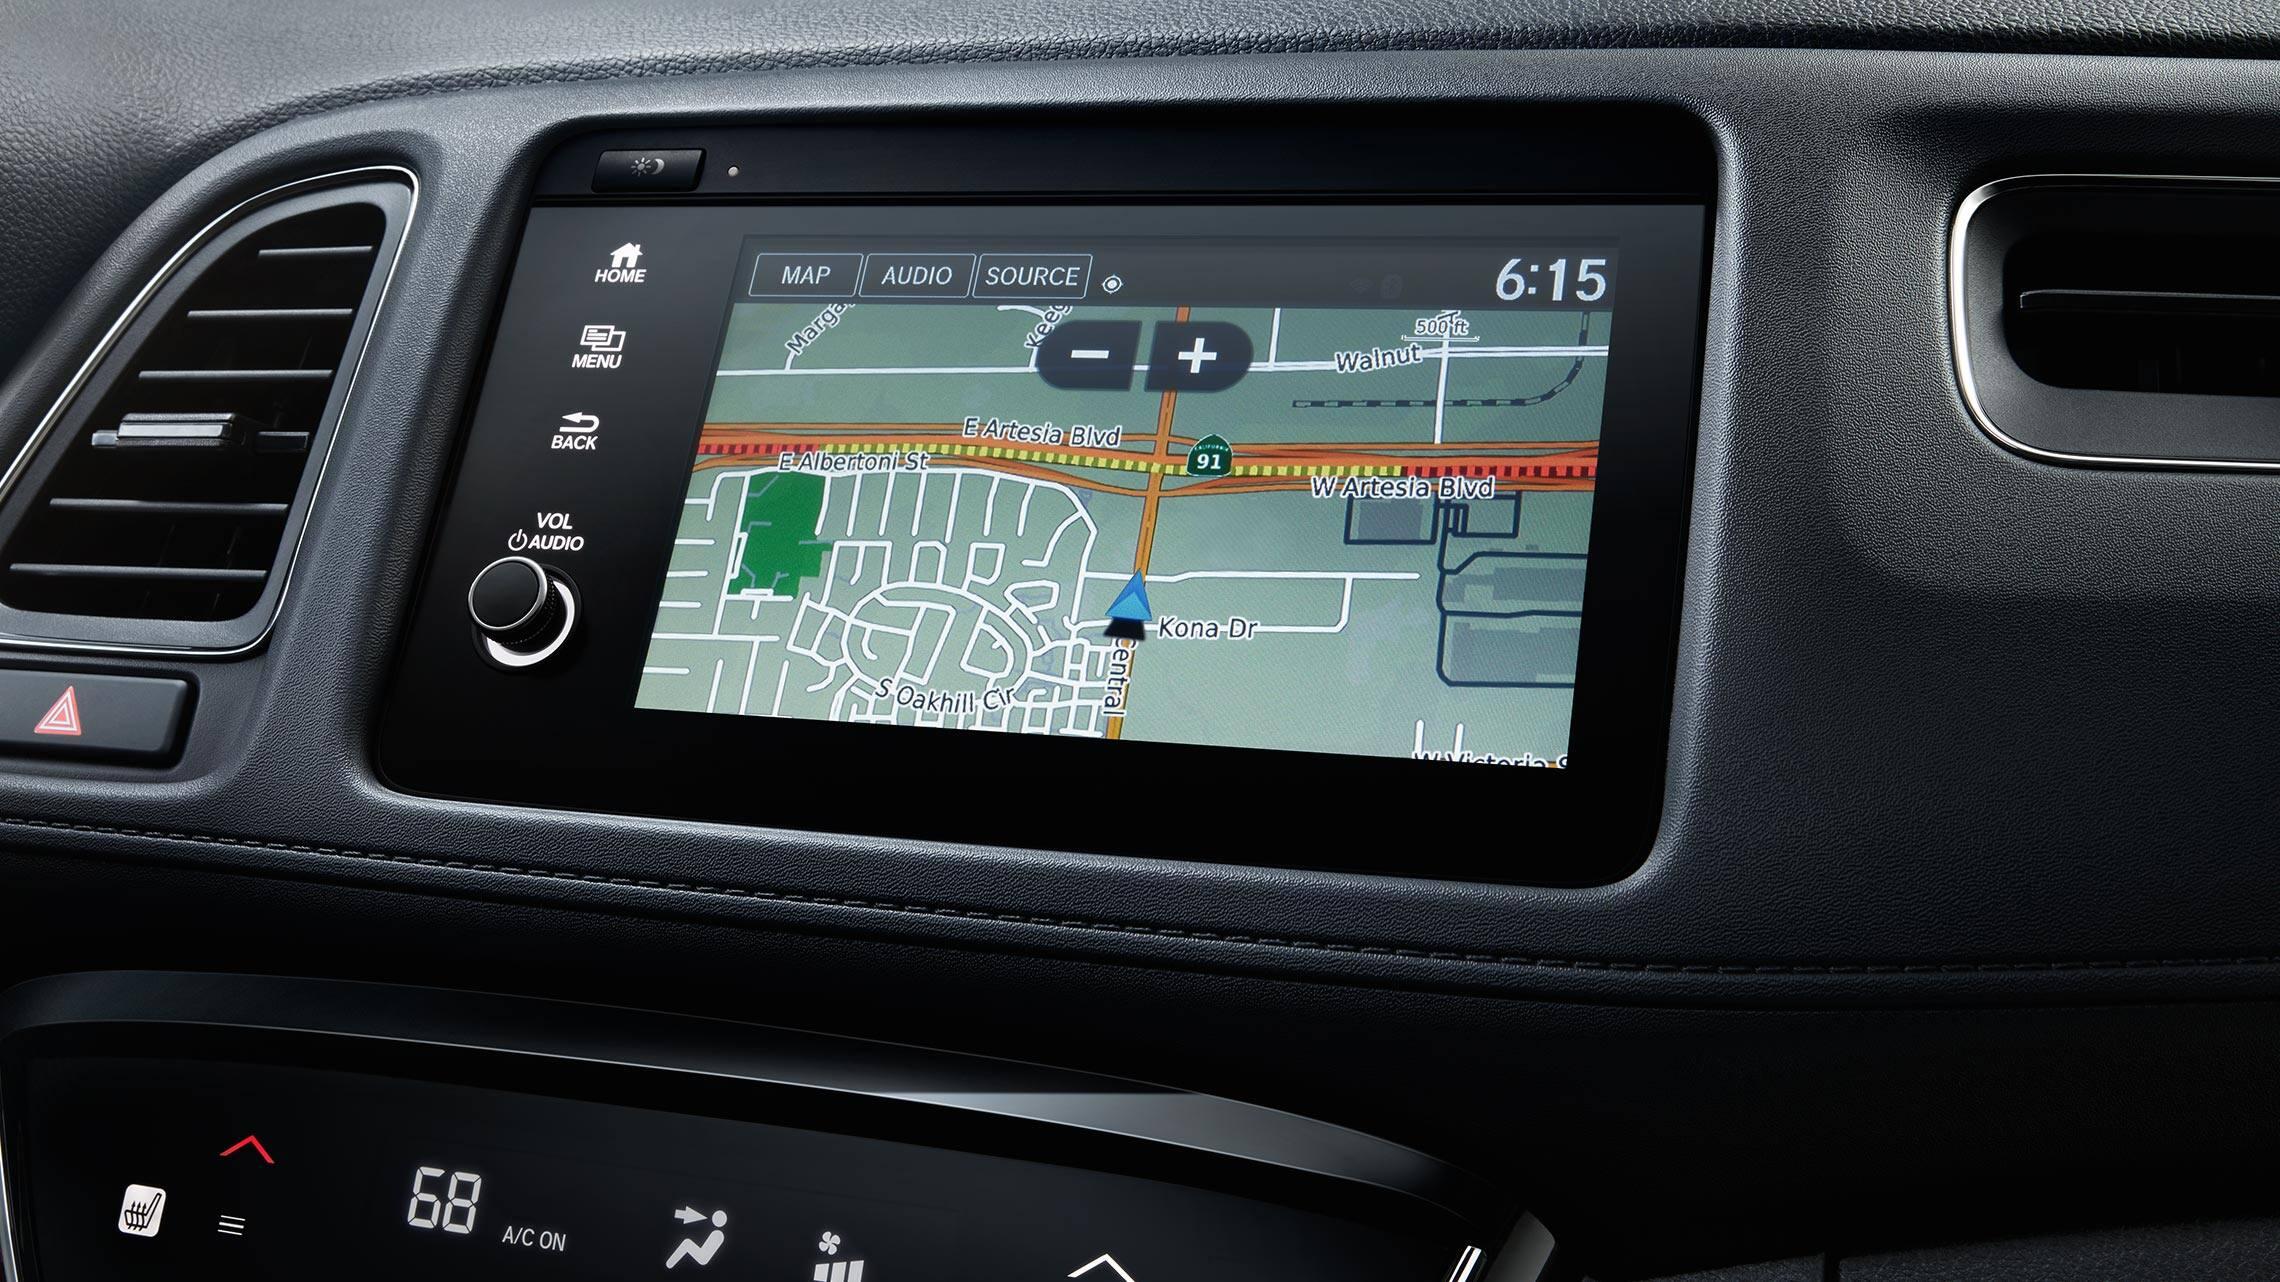 Detalle de Honda Satellite-Linked Navigation System™ en el sistema de audio con pantalla táctil de la Honda HR-V Touring 2020.